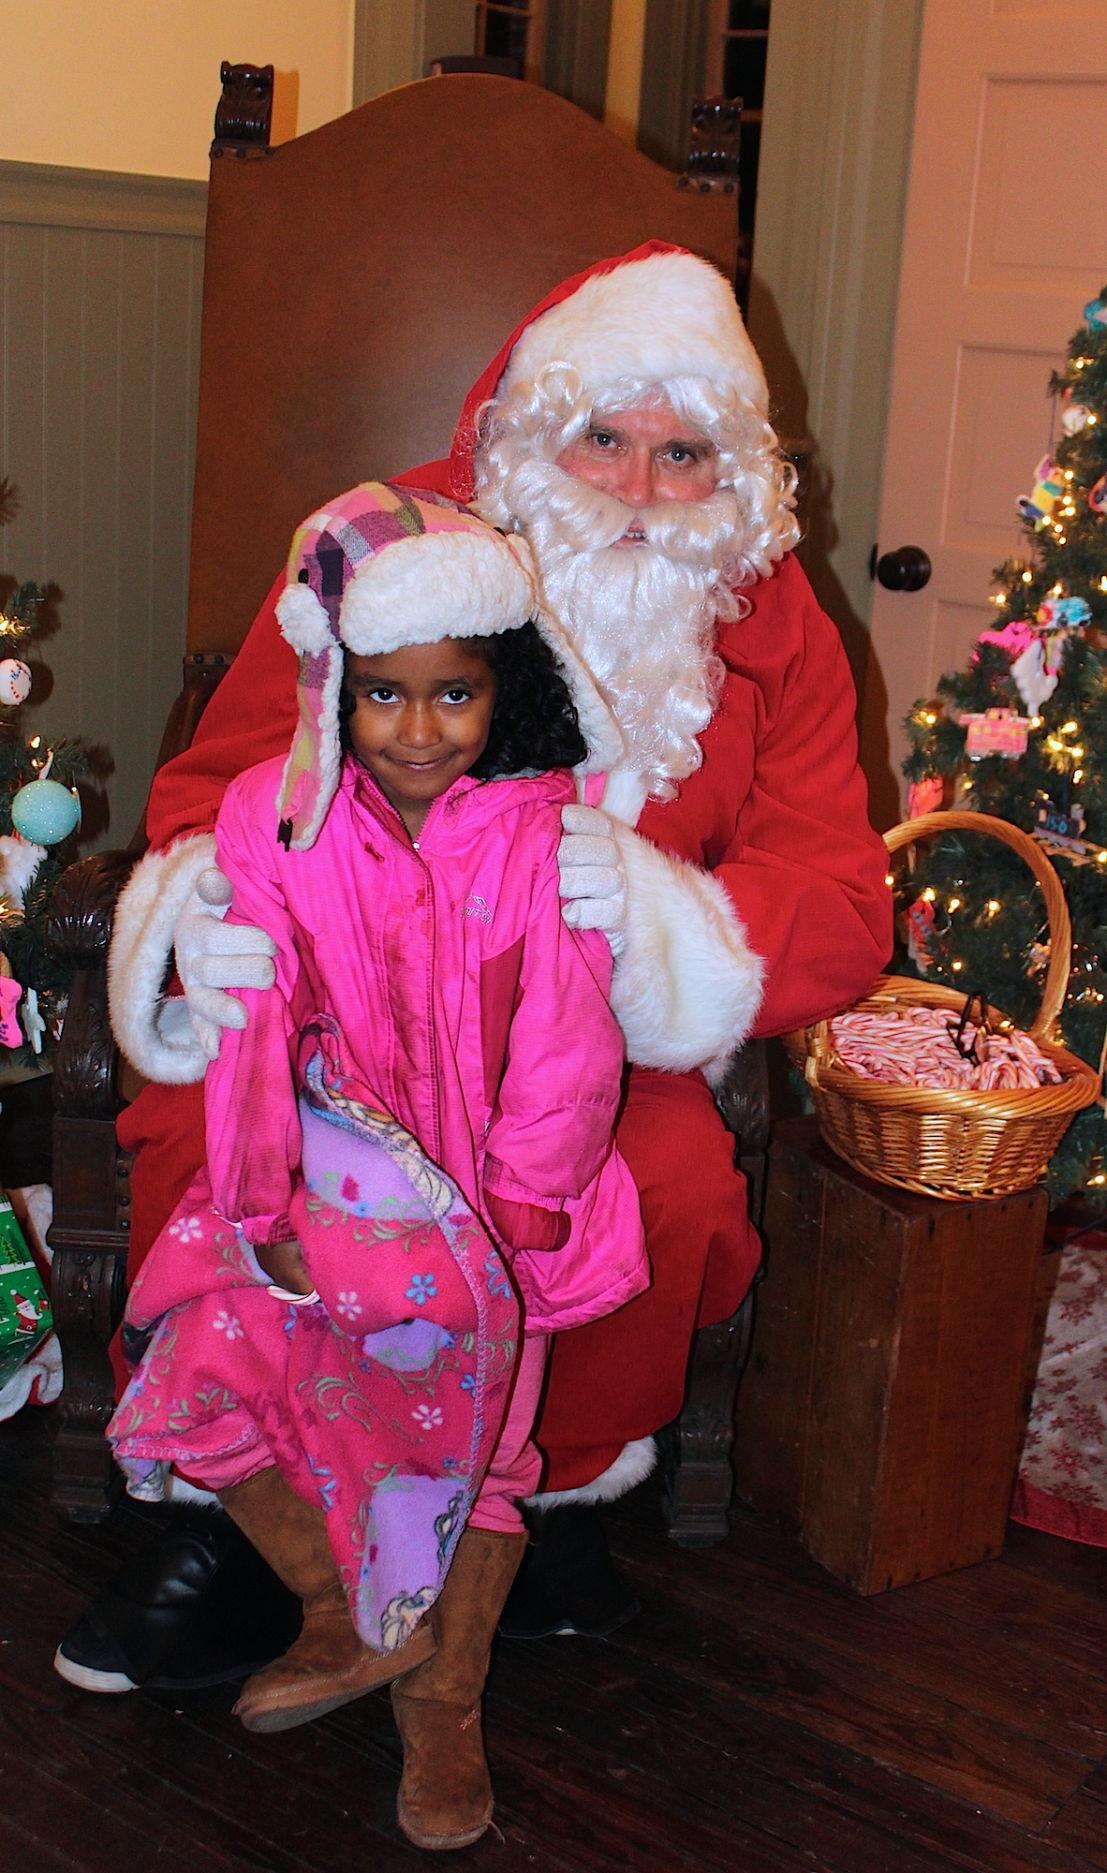 Denton Md Christmas Parade 2021 Three Parades Highlight Holiday Events News Myeasternshoremd Com